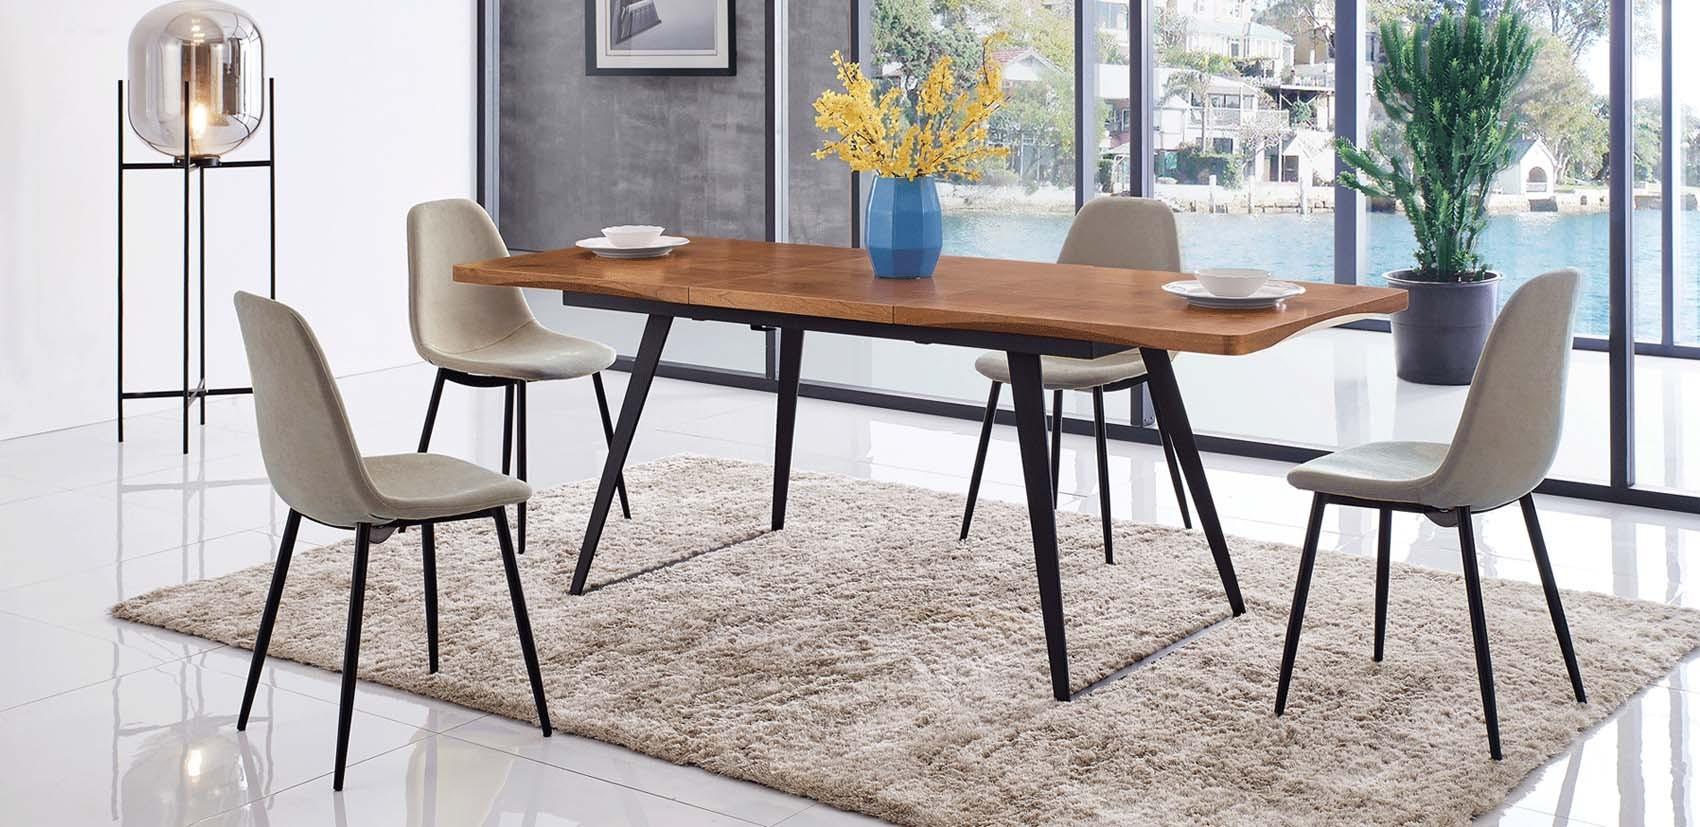 Buy Italian Furniture Buy European Furniture Shop